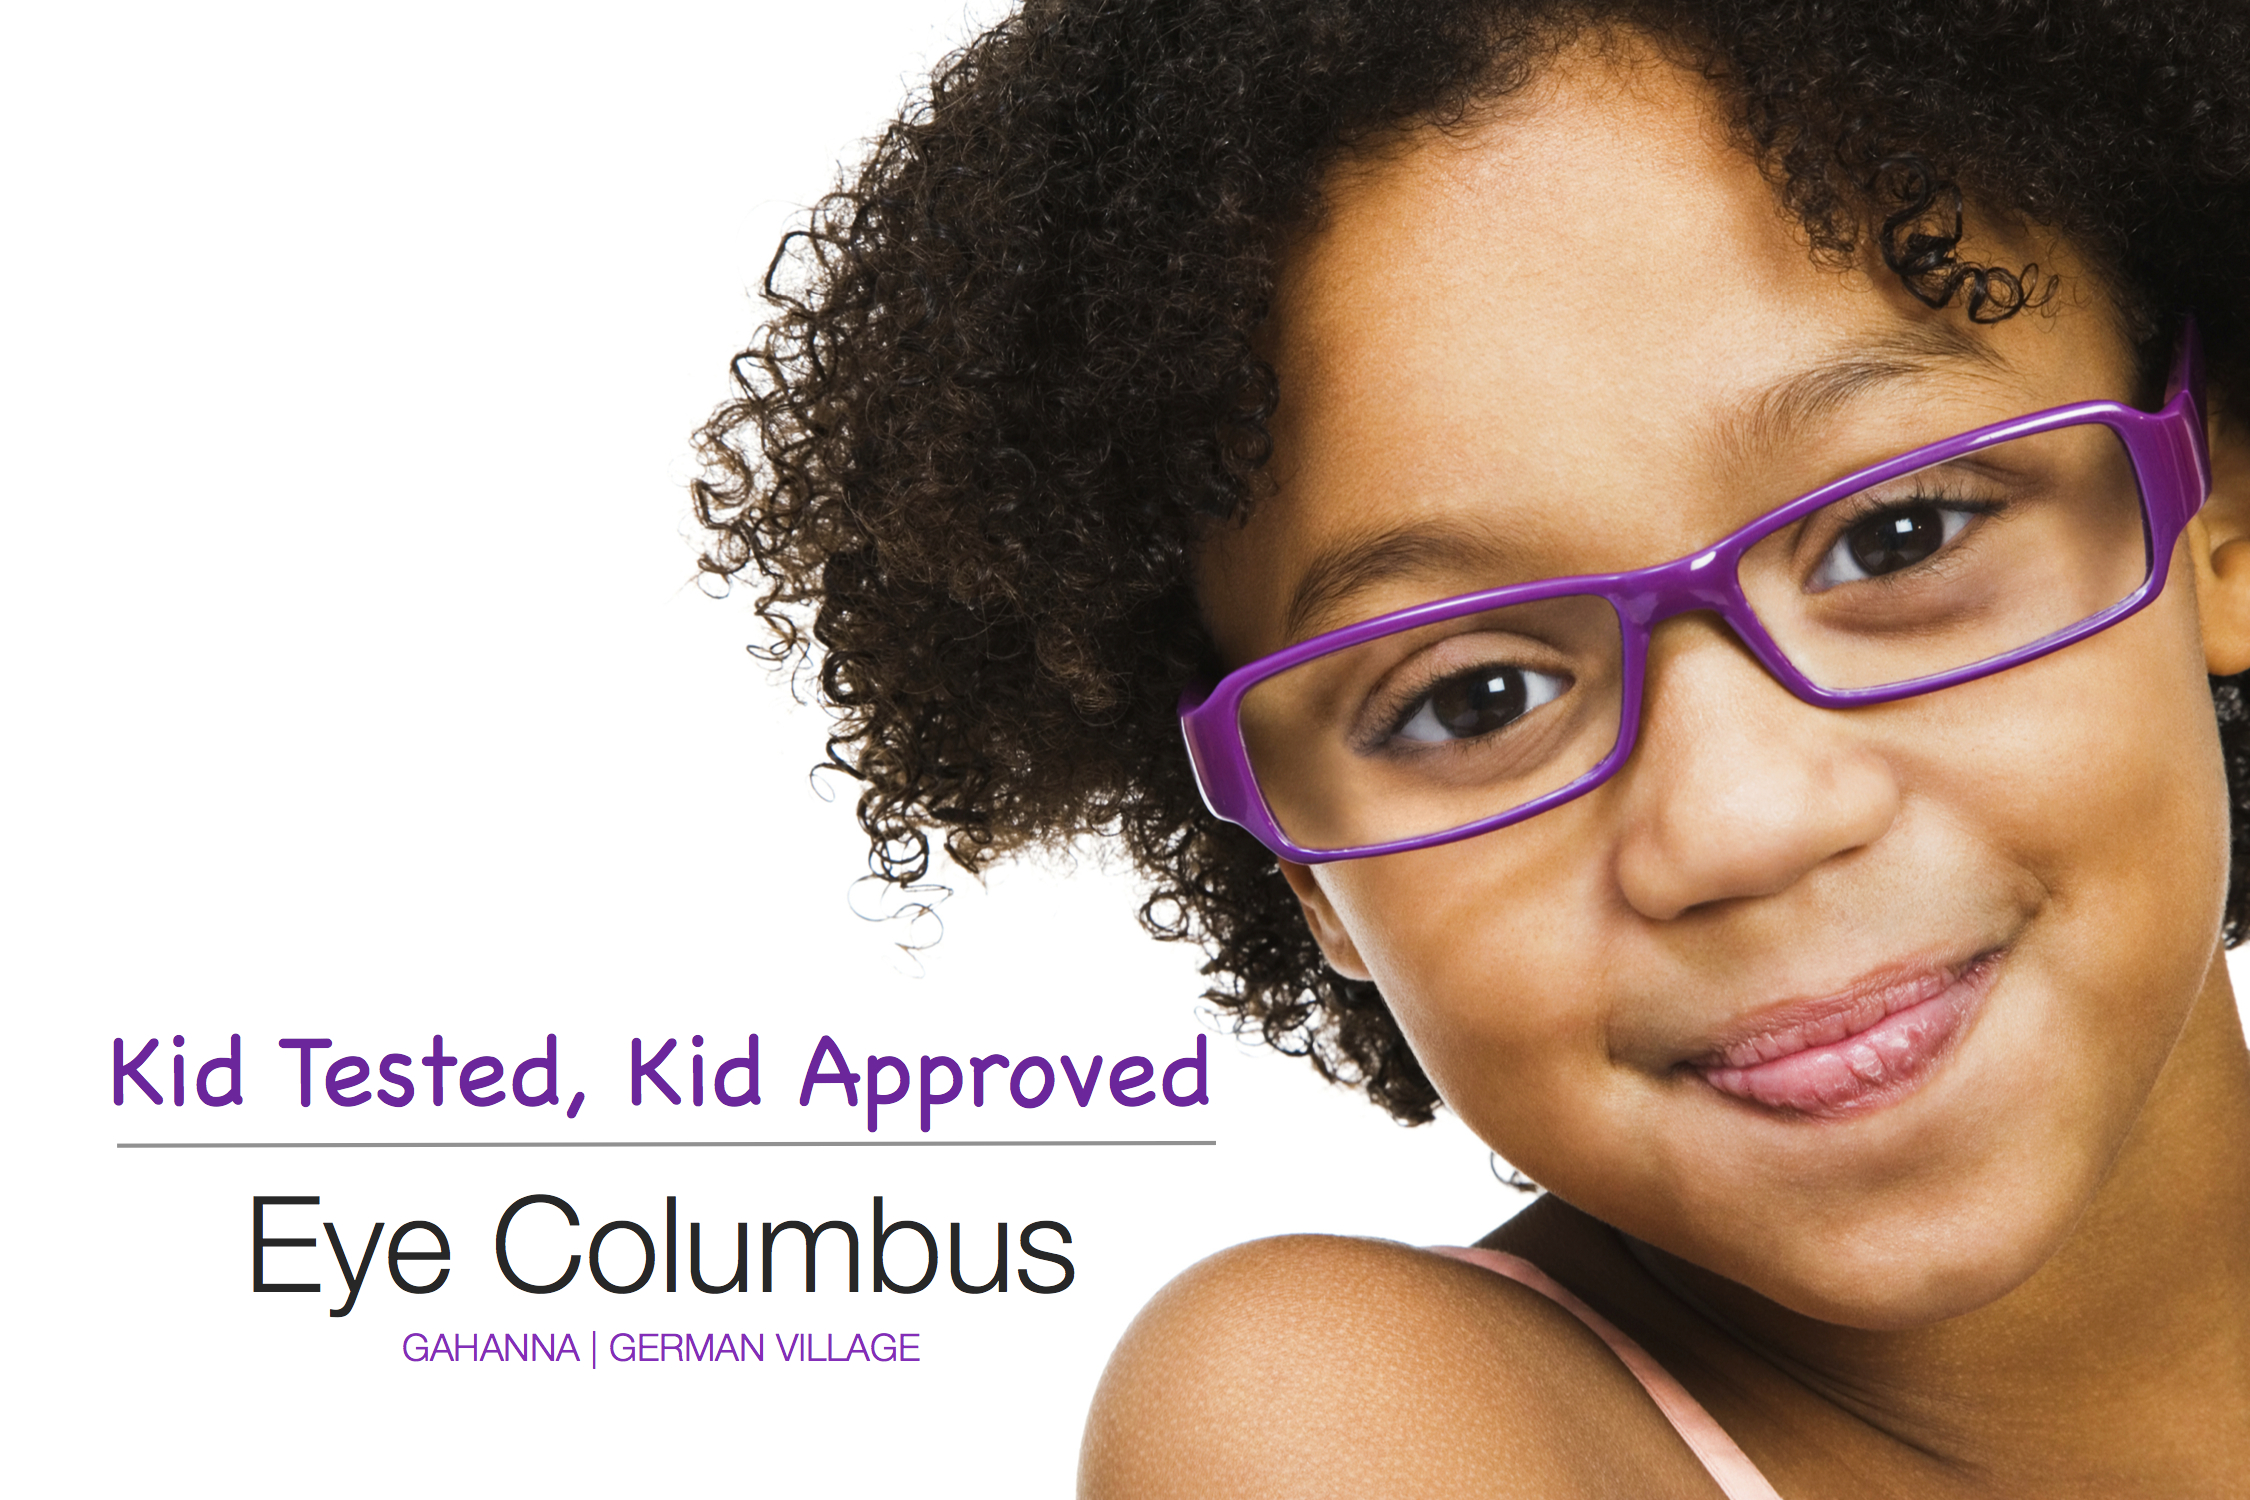 TV Kid2 Kid Tested Kid Approved.jpg